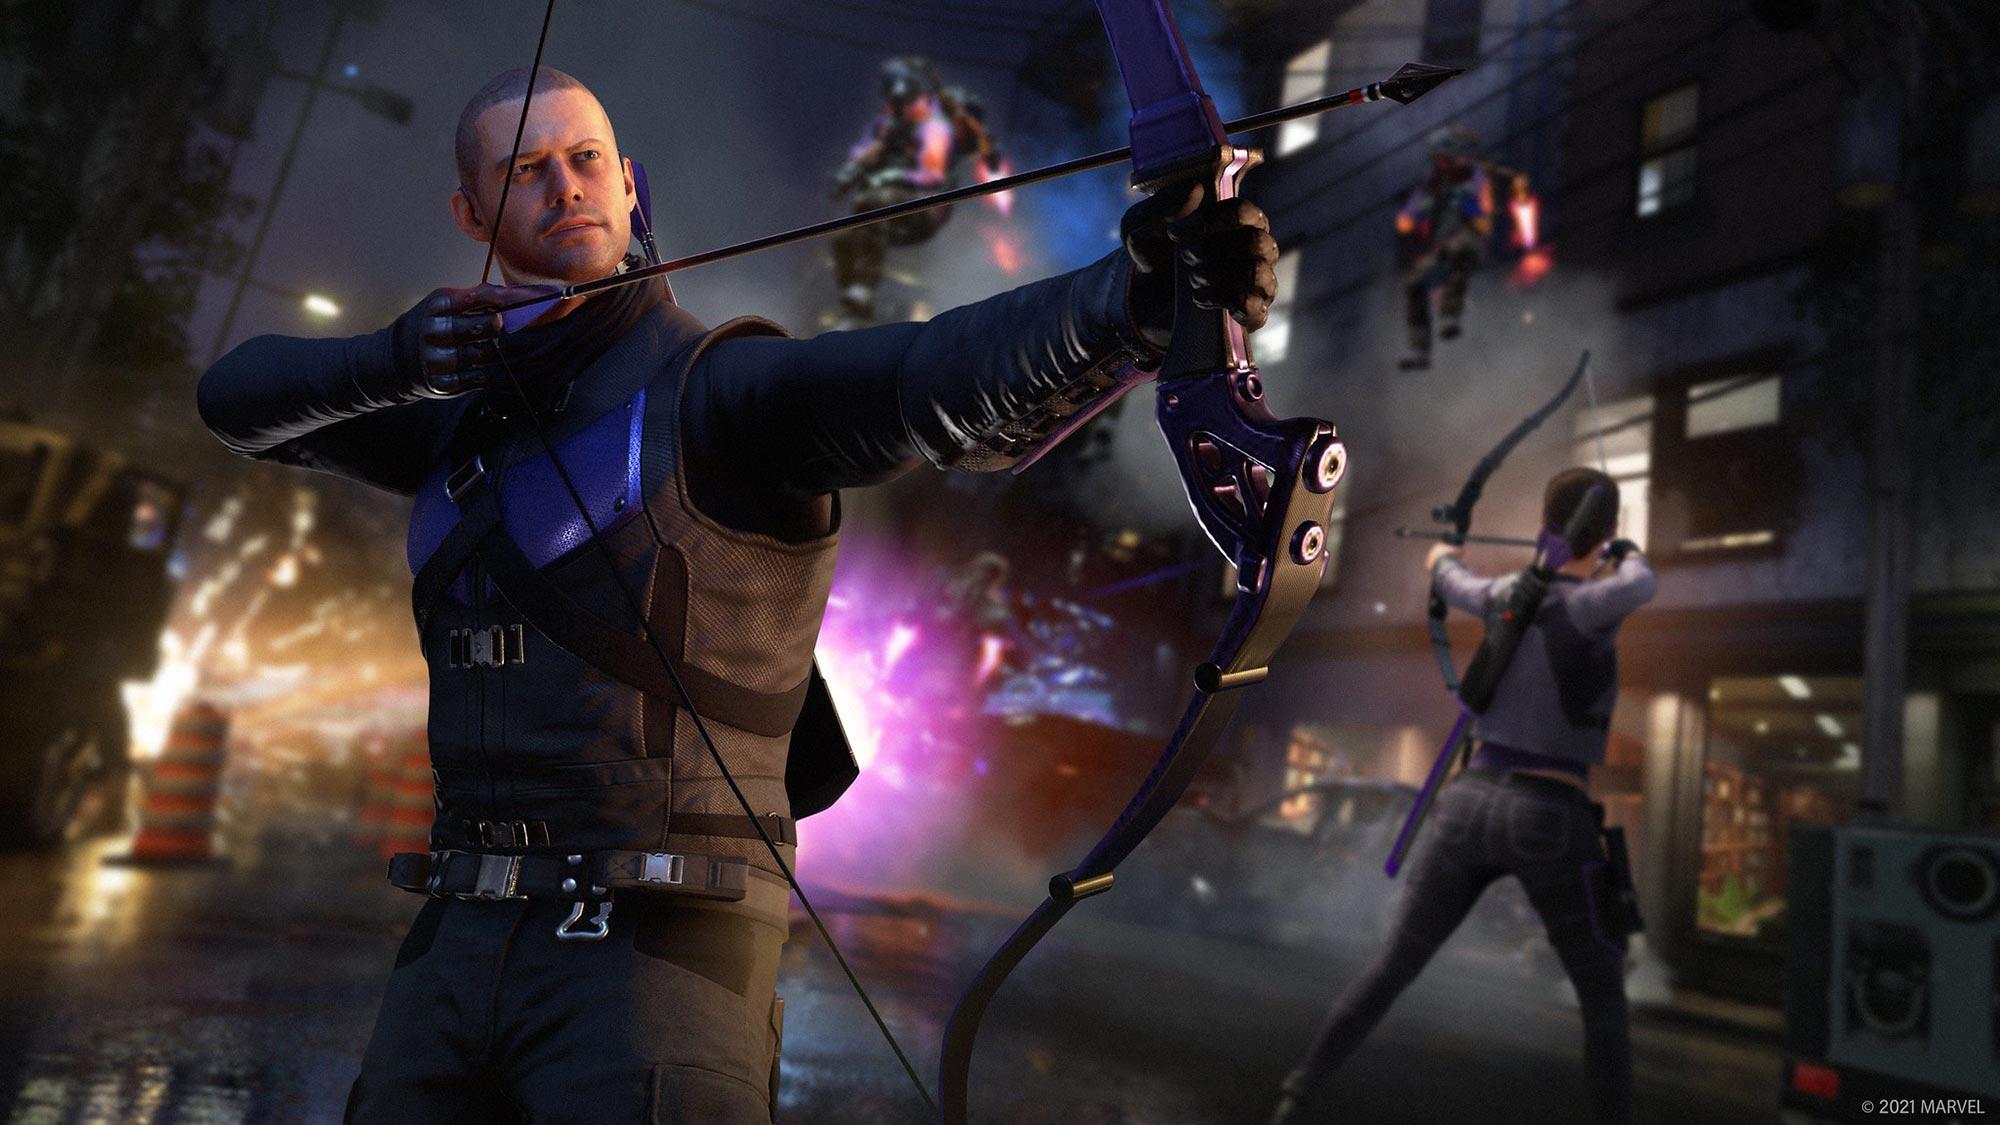 Hawkeye Joins Marvel's Avengers Video Game